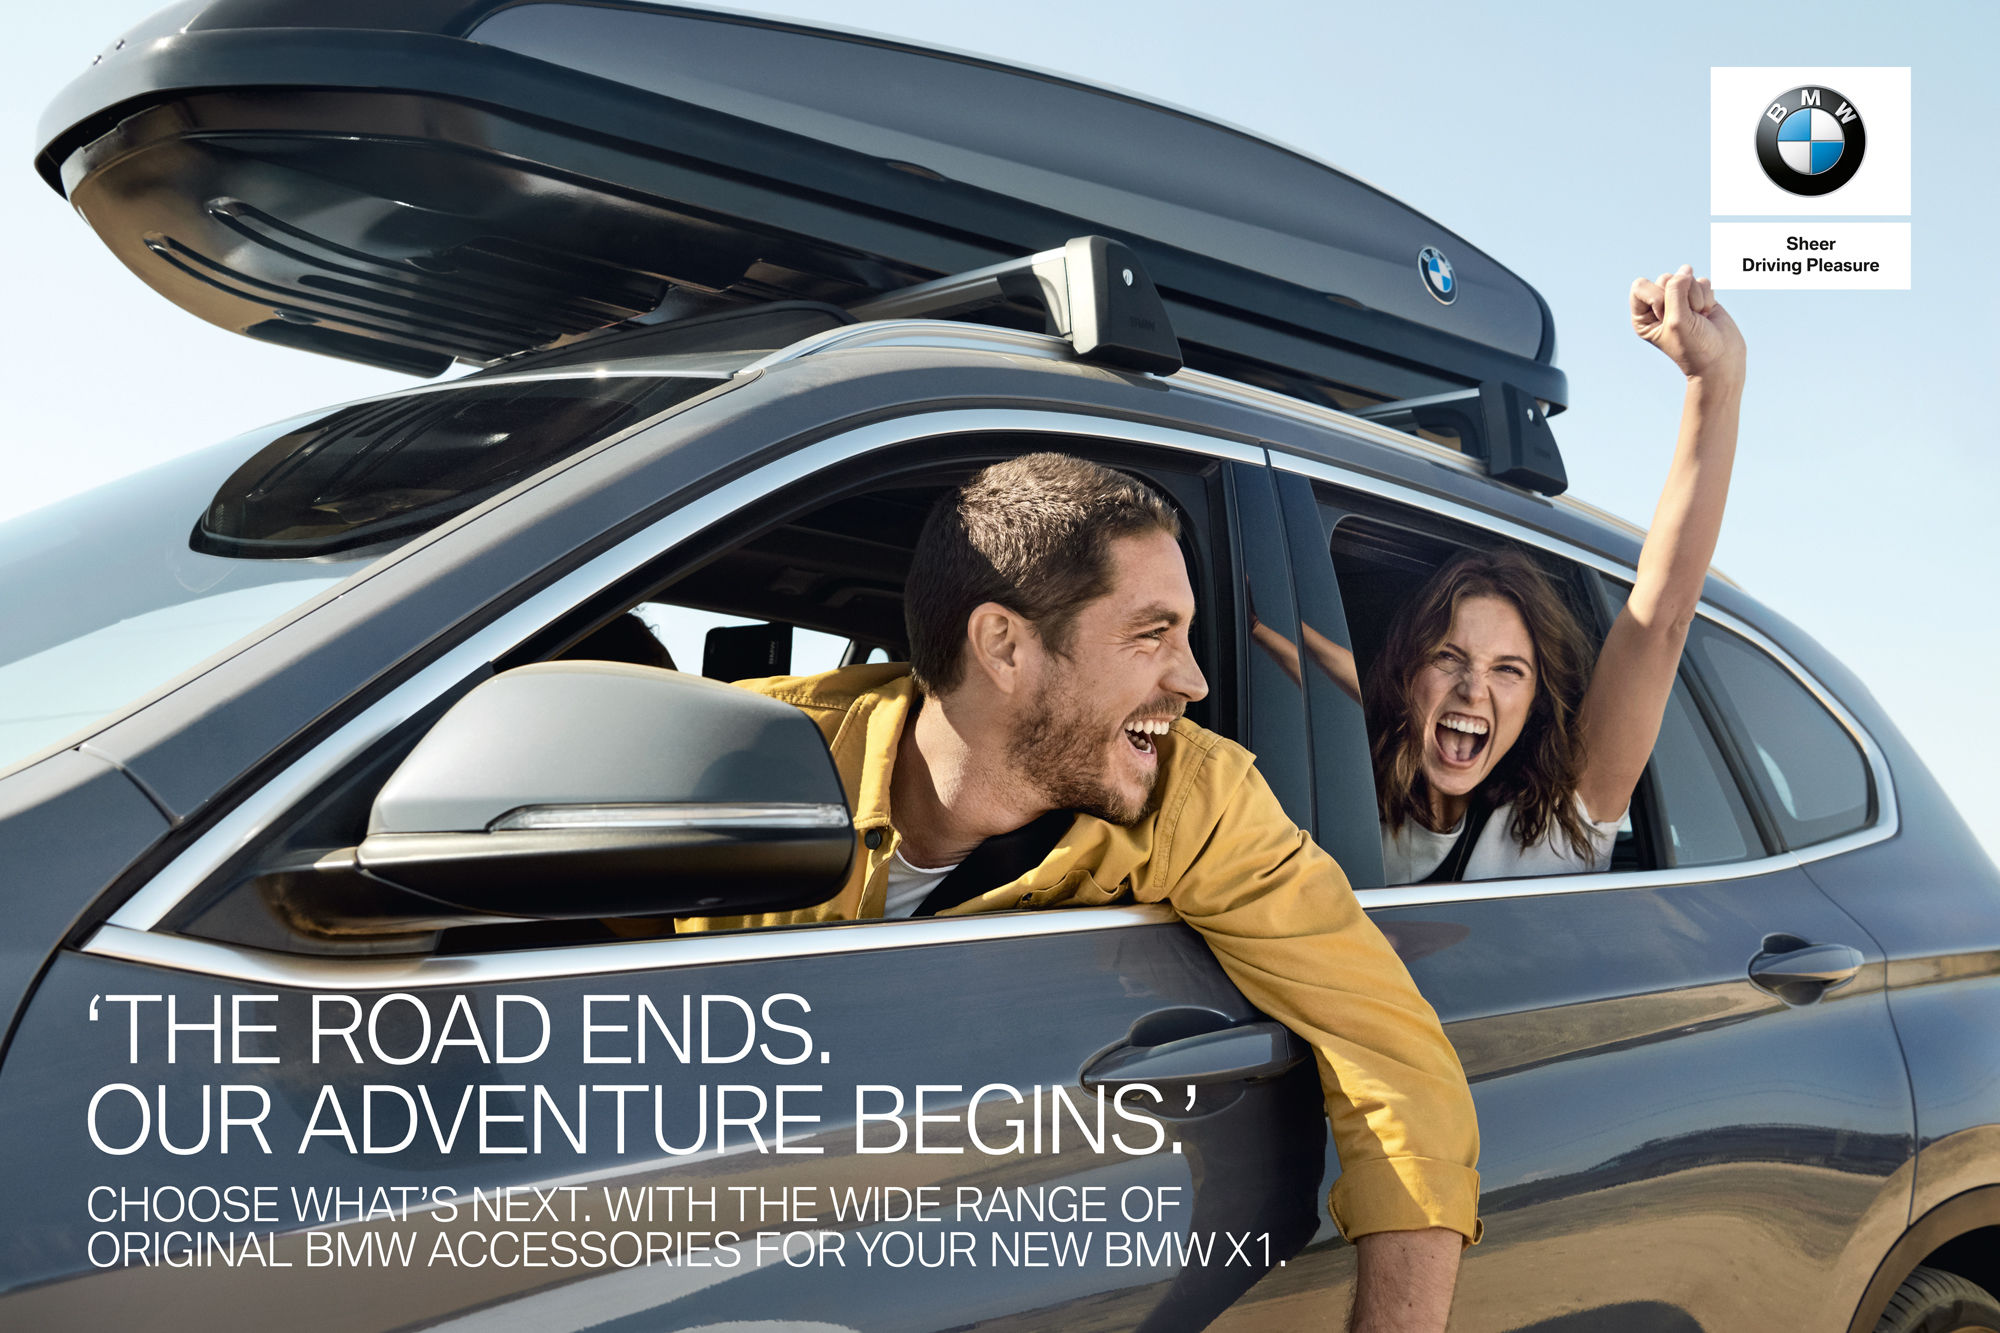 EDISONGA for BMW X1 ACCESSORIES